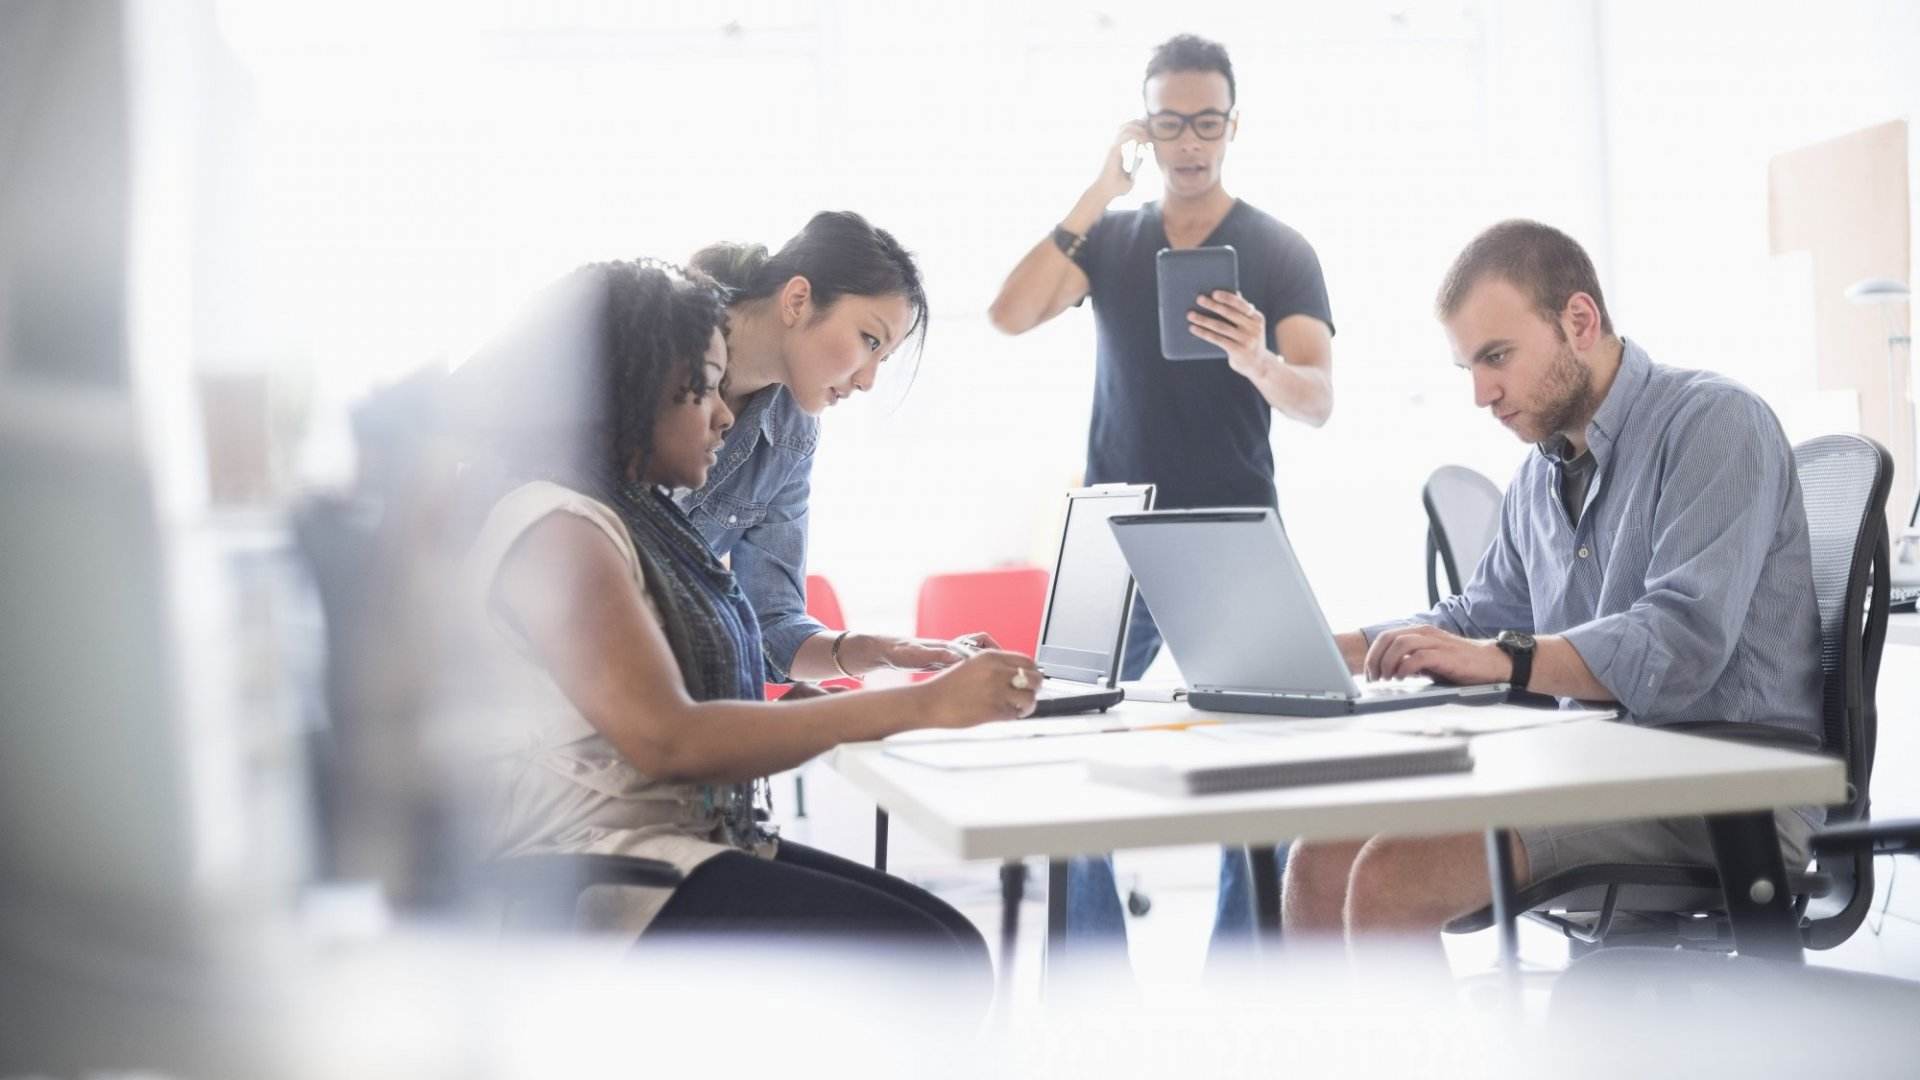 5 Dangerous Generalizations About Millennial Professionals